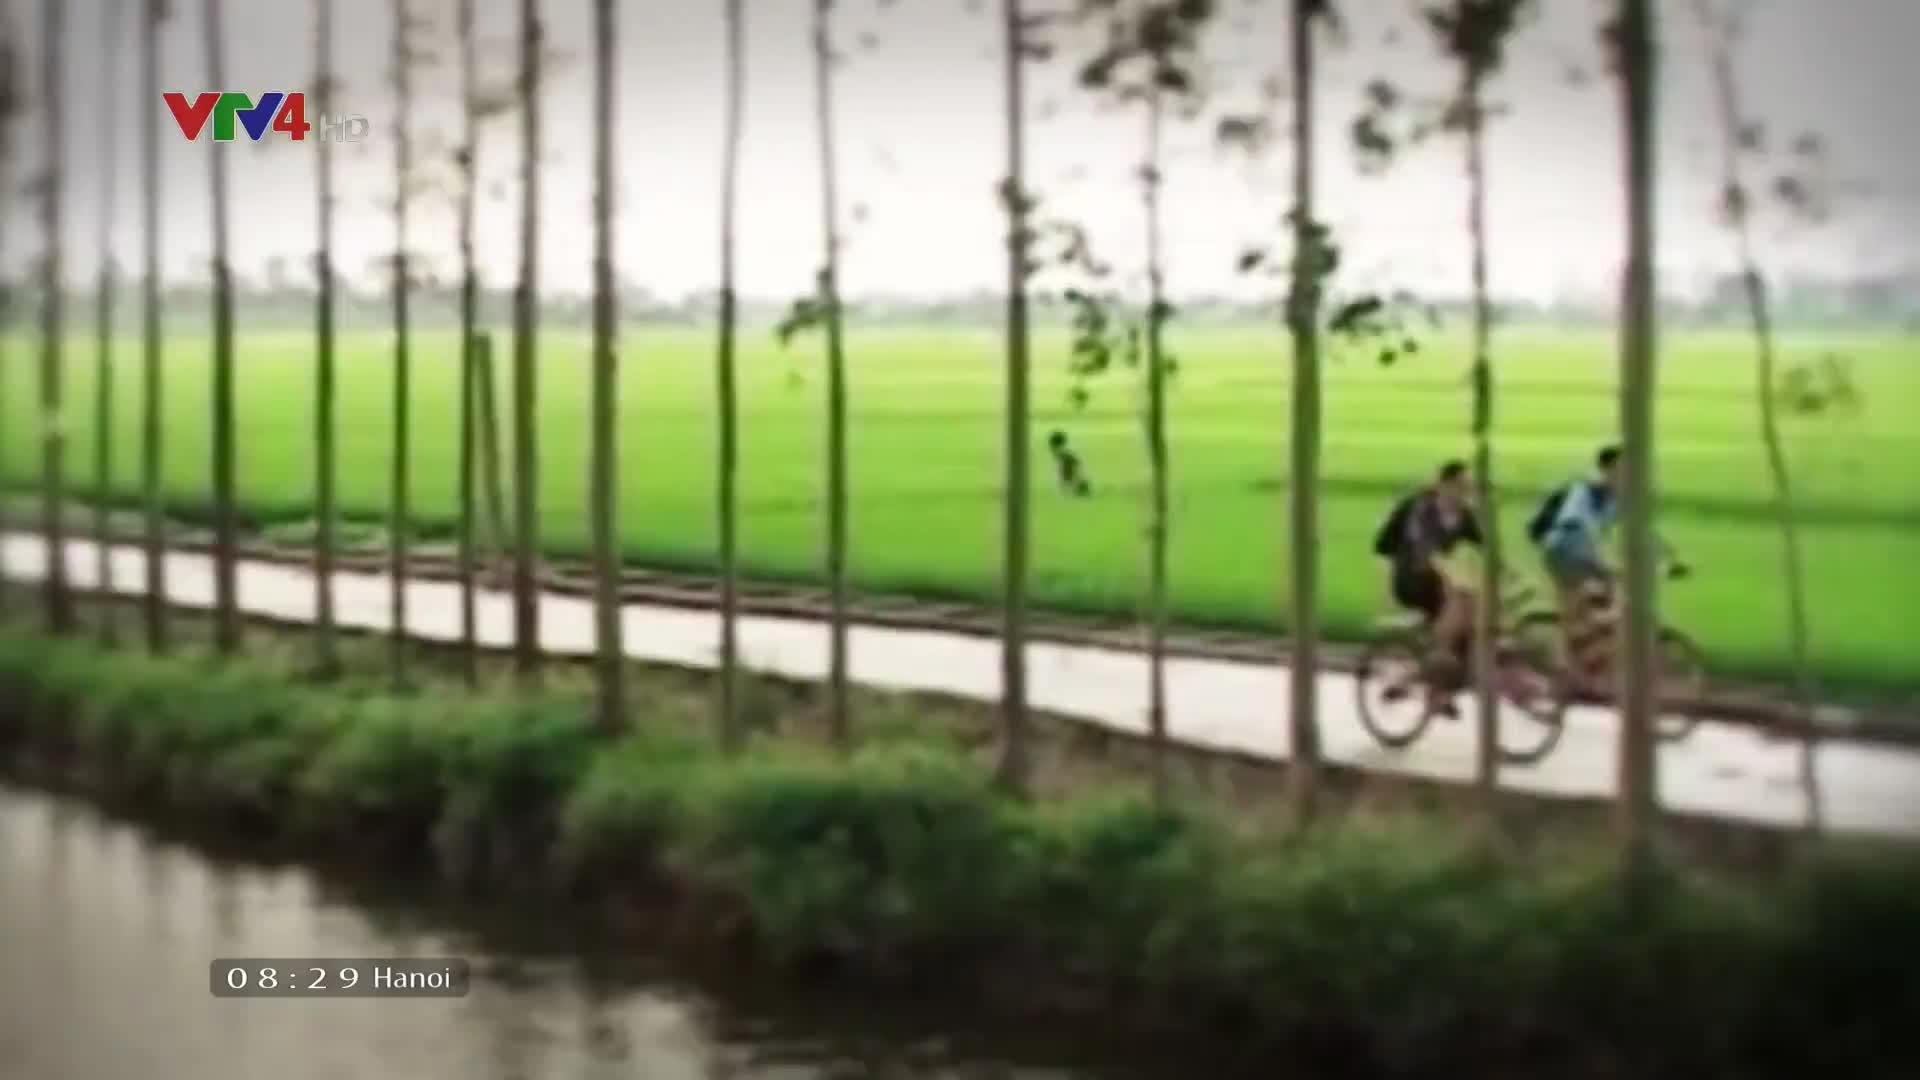 Vietnam Discovery: Mystery of wetland ecosystem